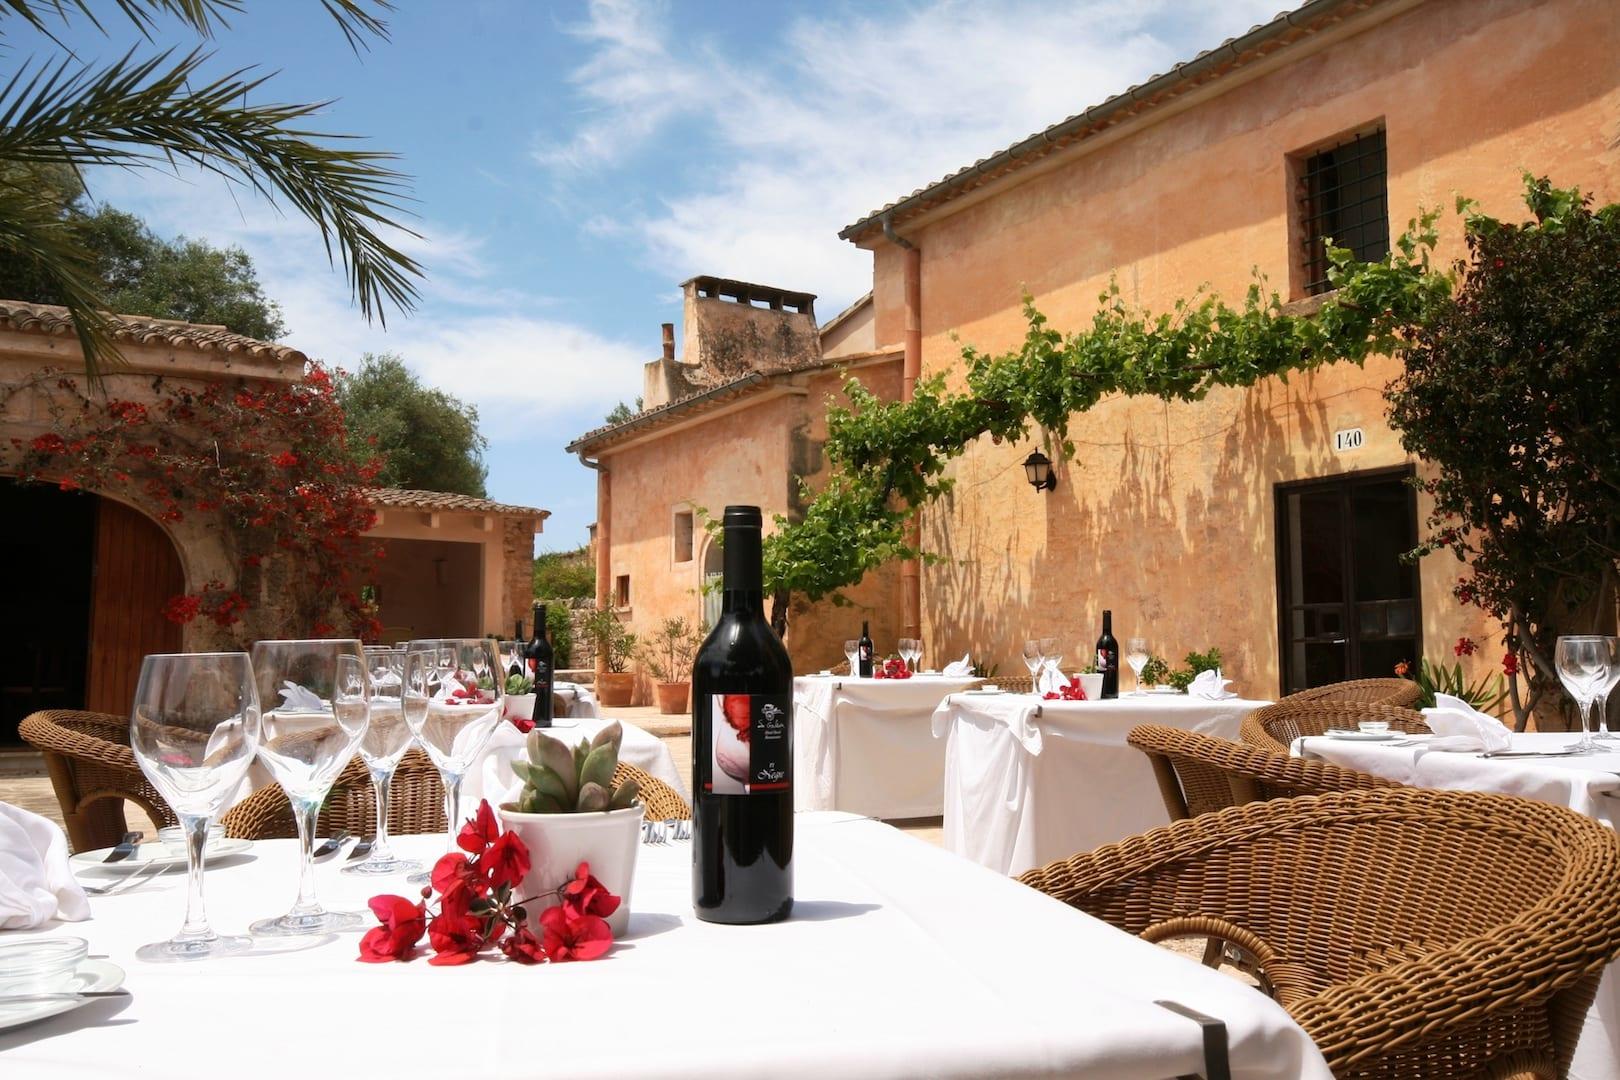 ISLA_Travel_Hotel_Sa_Galera_Restaurantterrasse